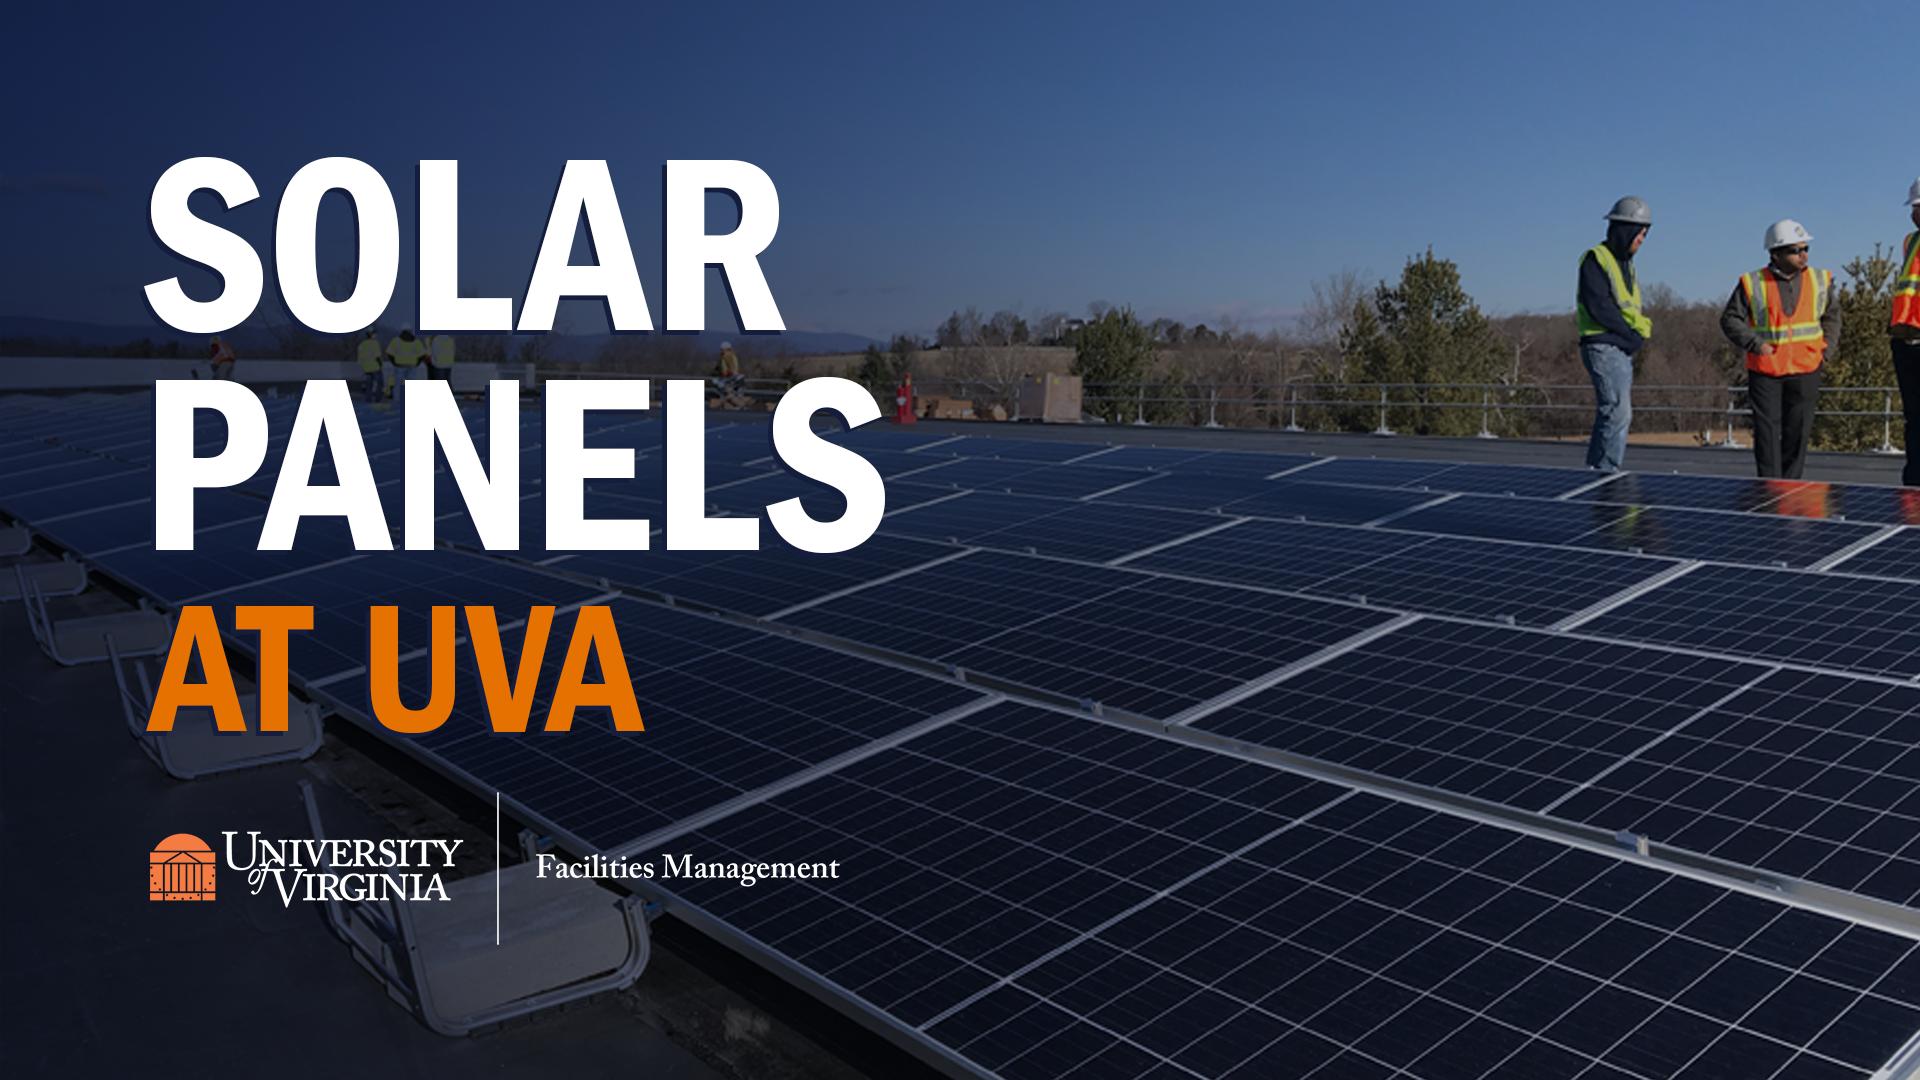 Solar Panels at UVA